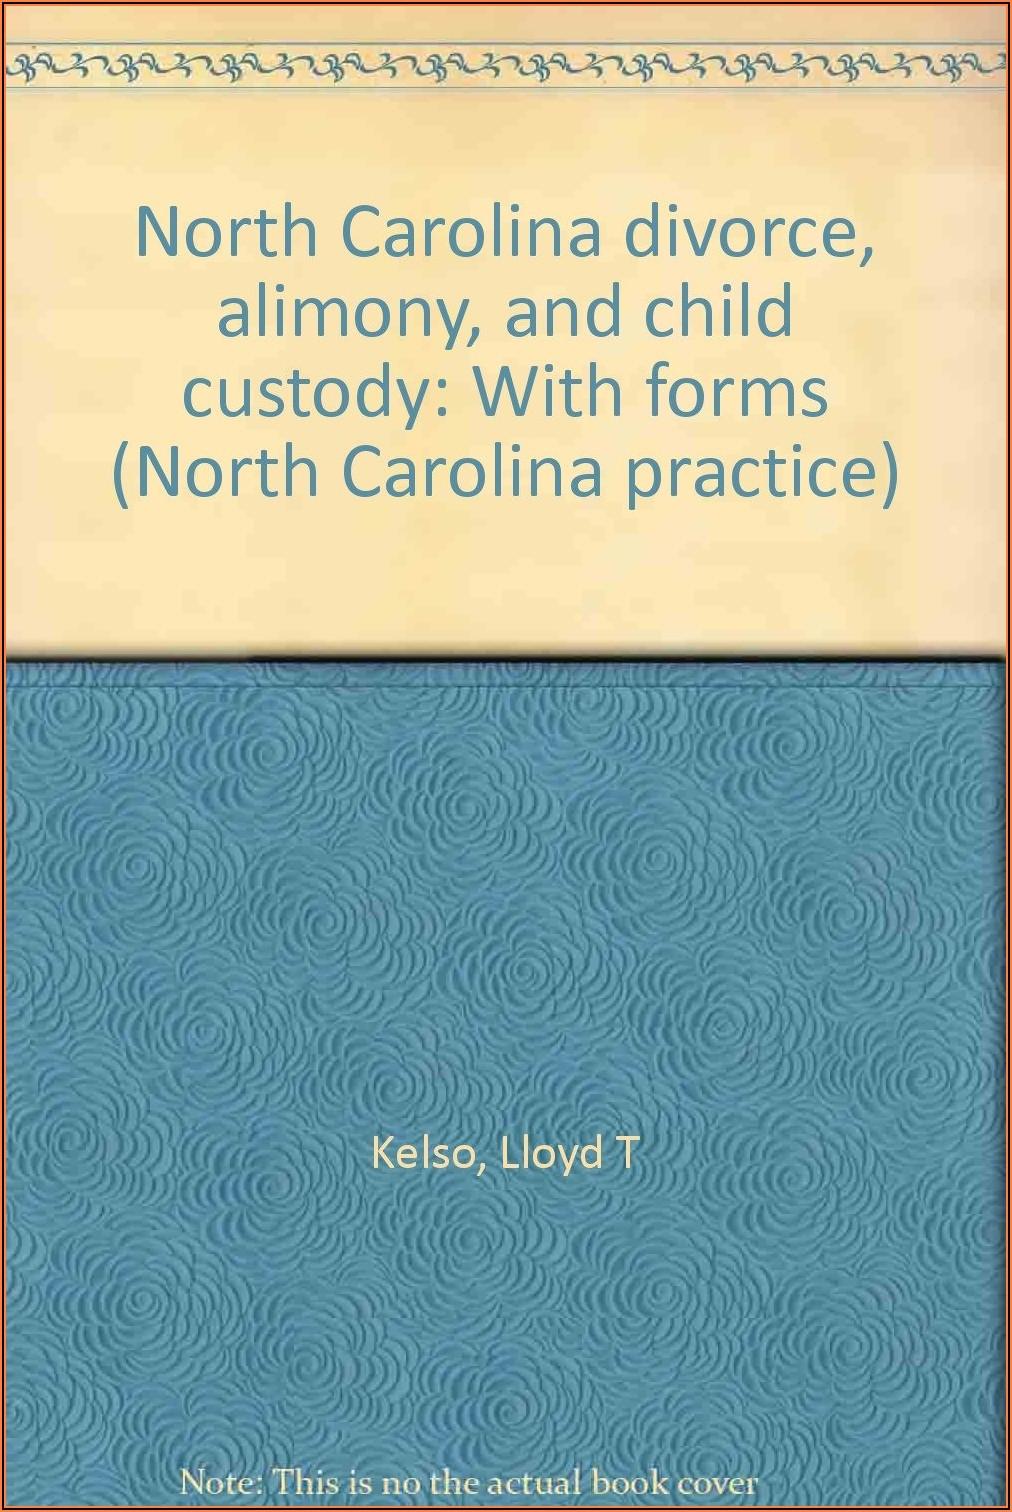 North Carolina Custody Forms